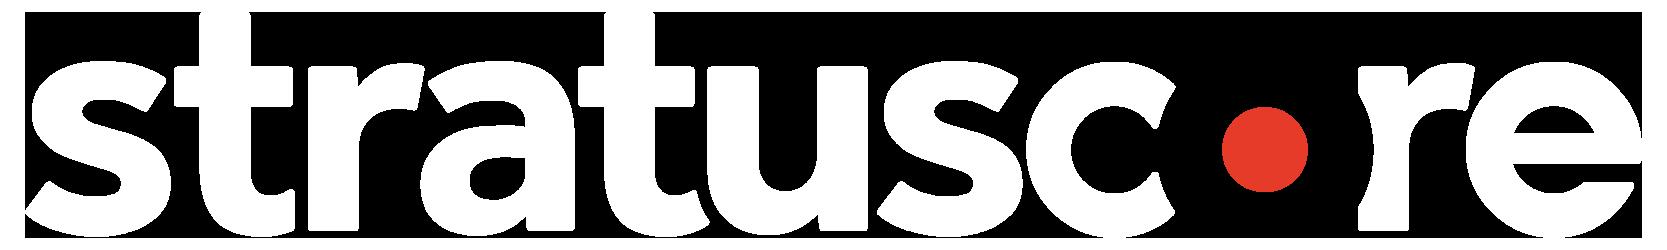 https://www.stratuscore.com/assets/img/stratuscore_logo.png